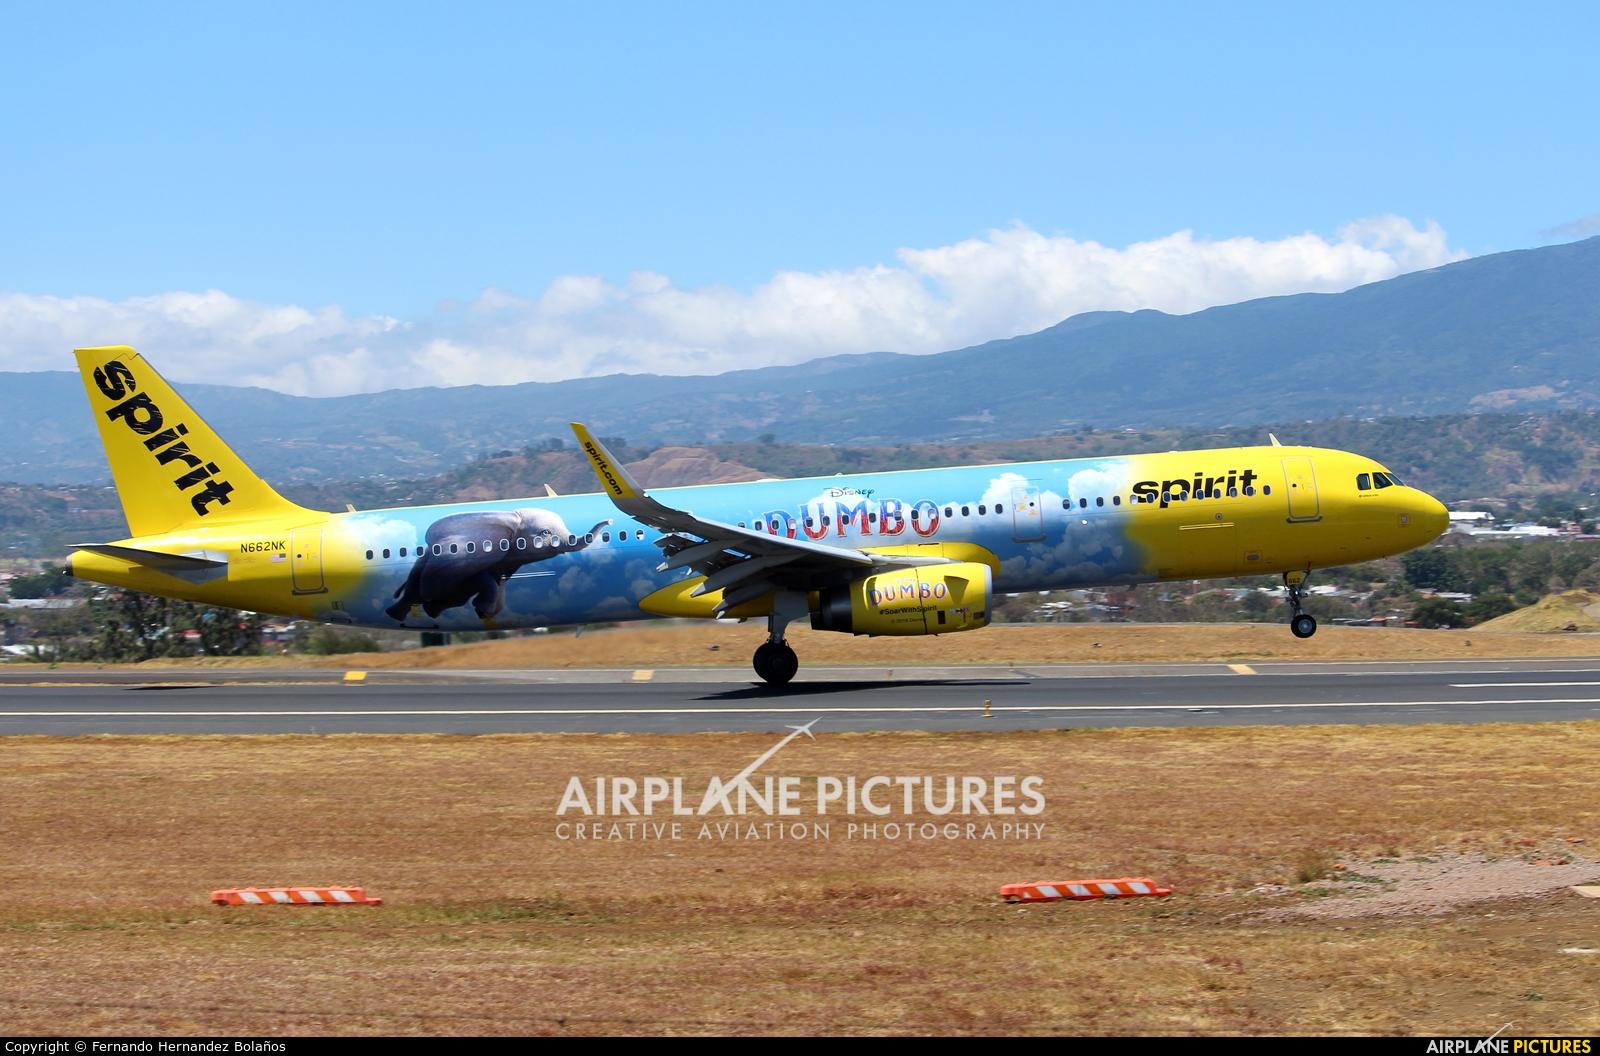 Spirit Airlines N662NK aircraft at San Jose - Juan Santamaría Intl